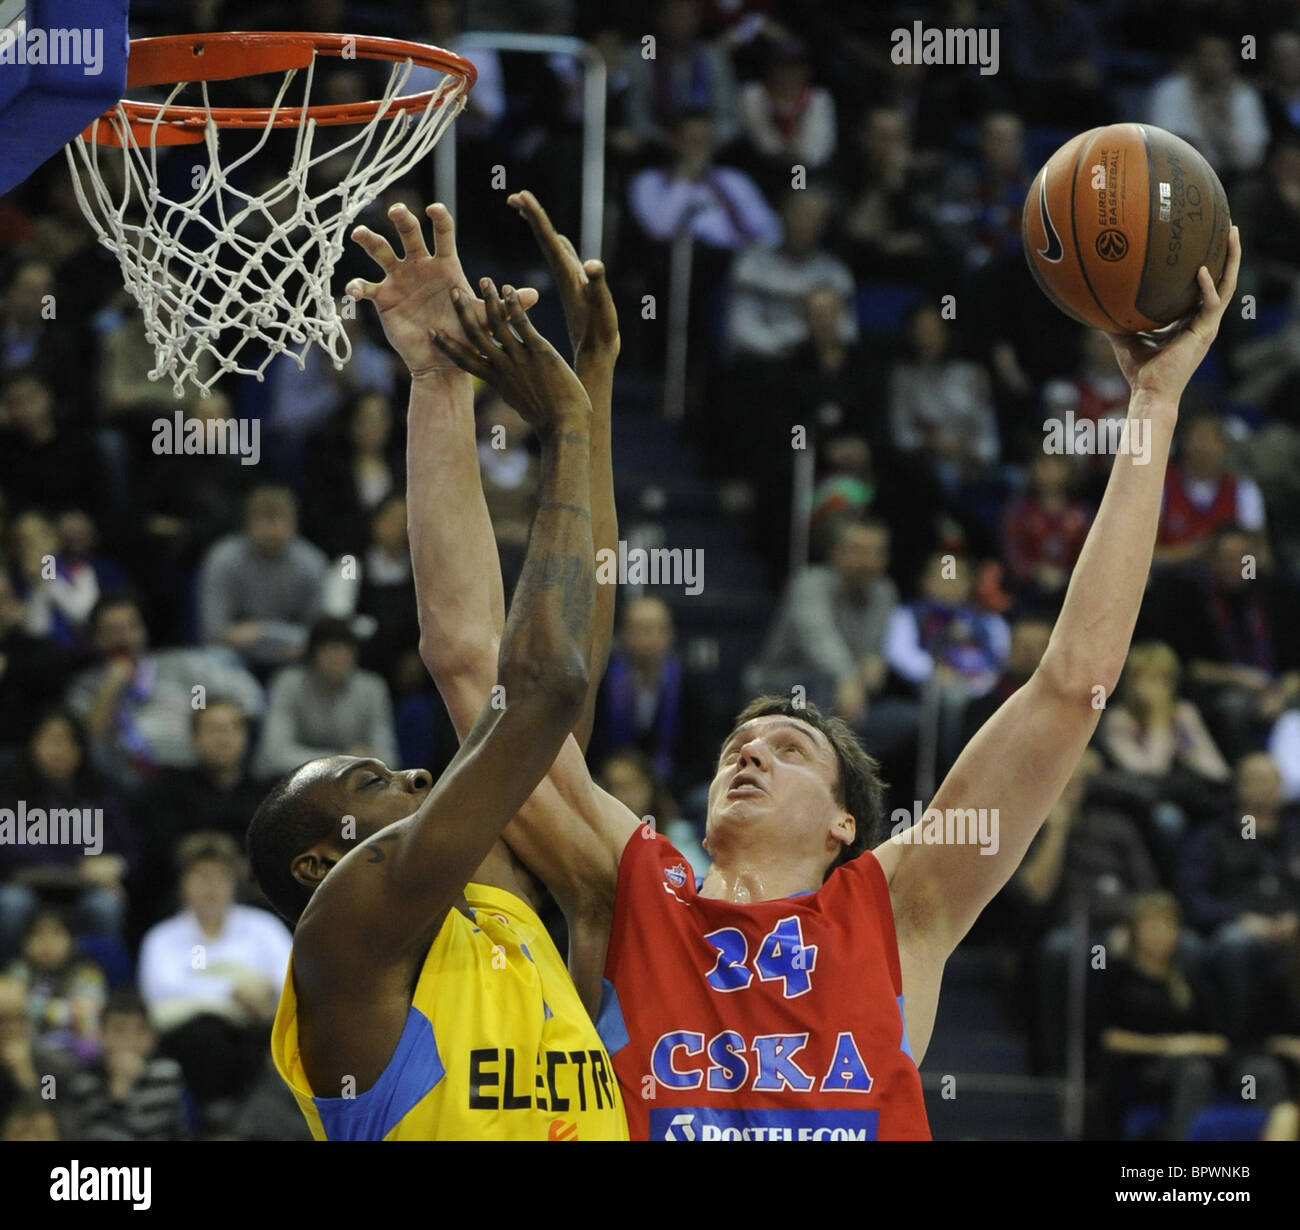 La Euroliga de baloncesto: CSKA Moscú 77 - 72 El Maccabi Electra Tel Aviv. Imagen De Stock